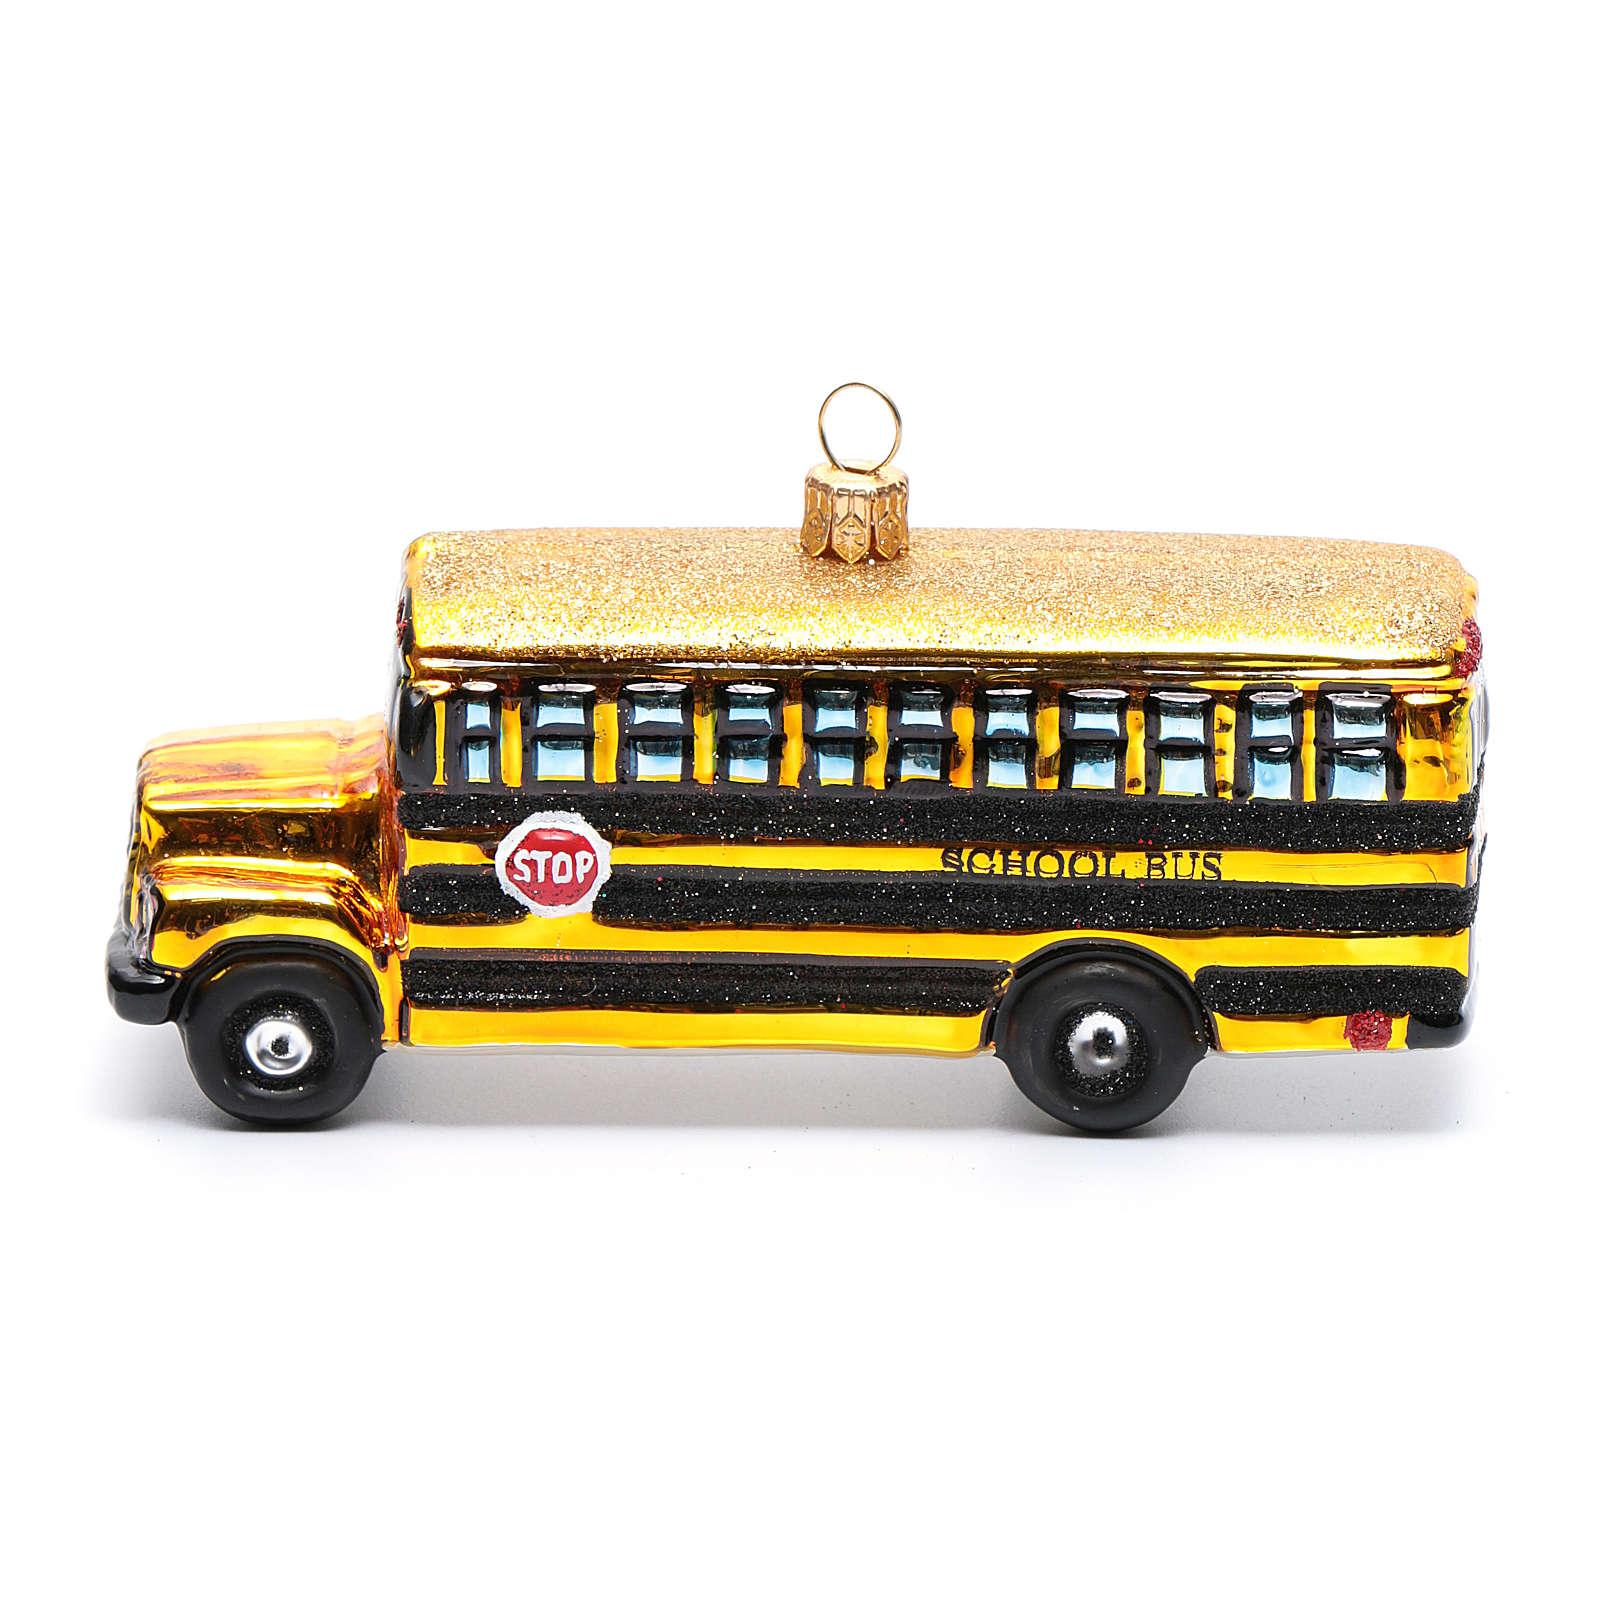 Autocarro escolar adorno vidro soprado árvore Natal 4